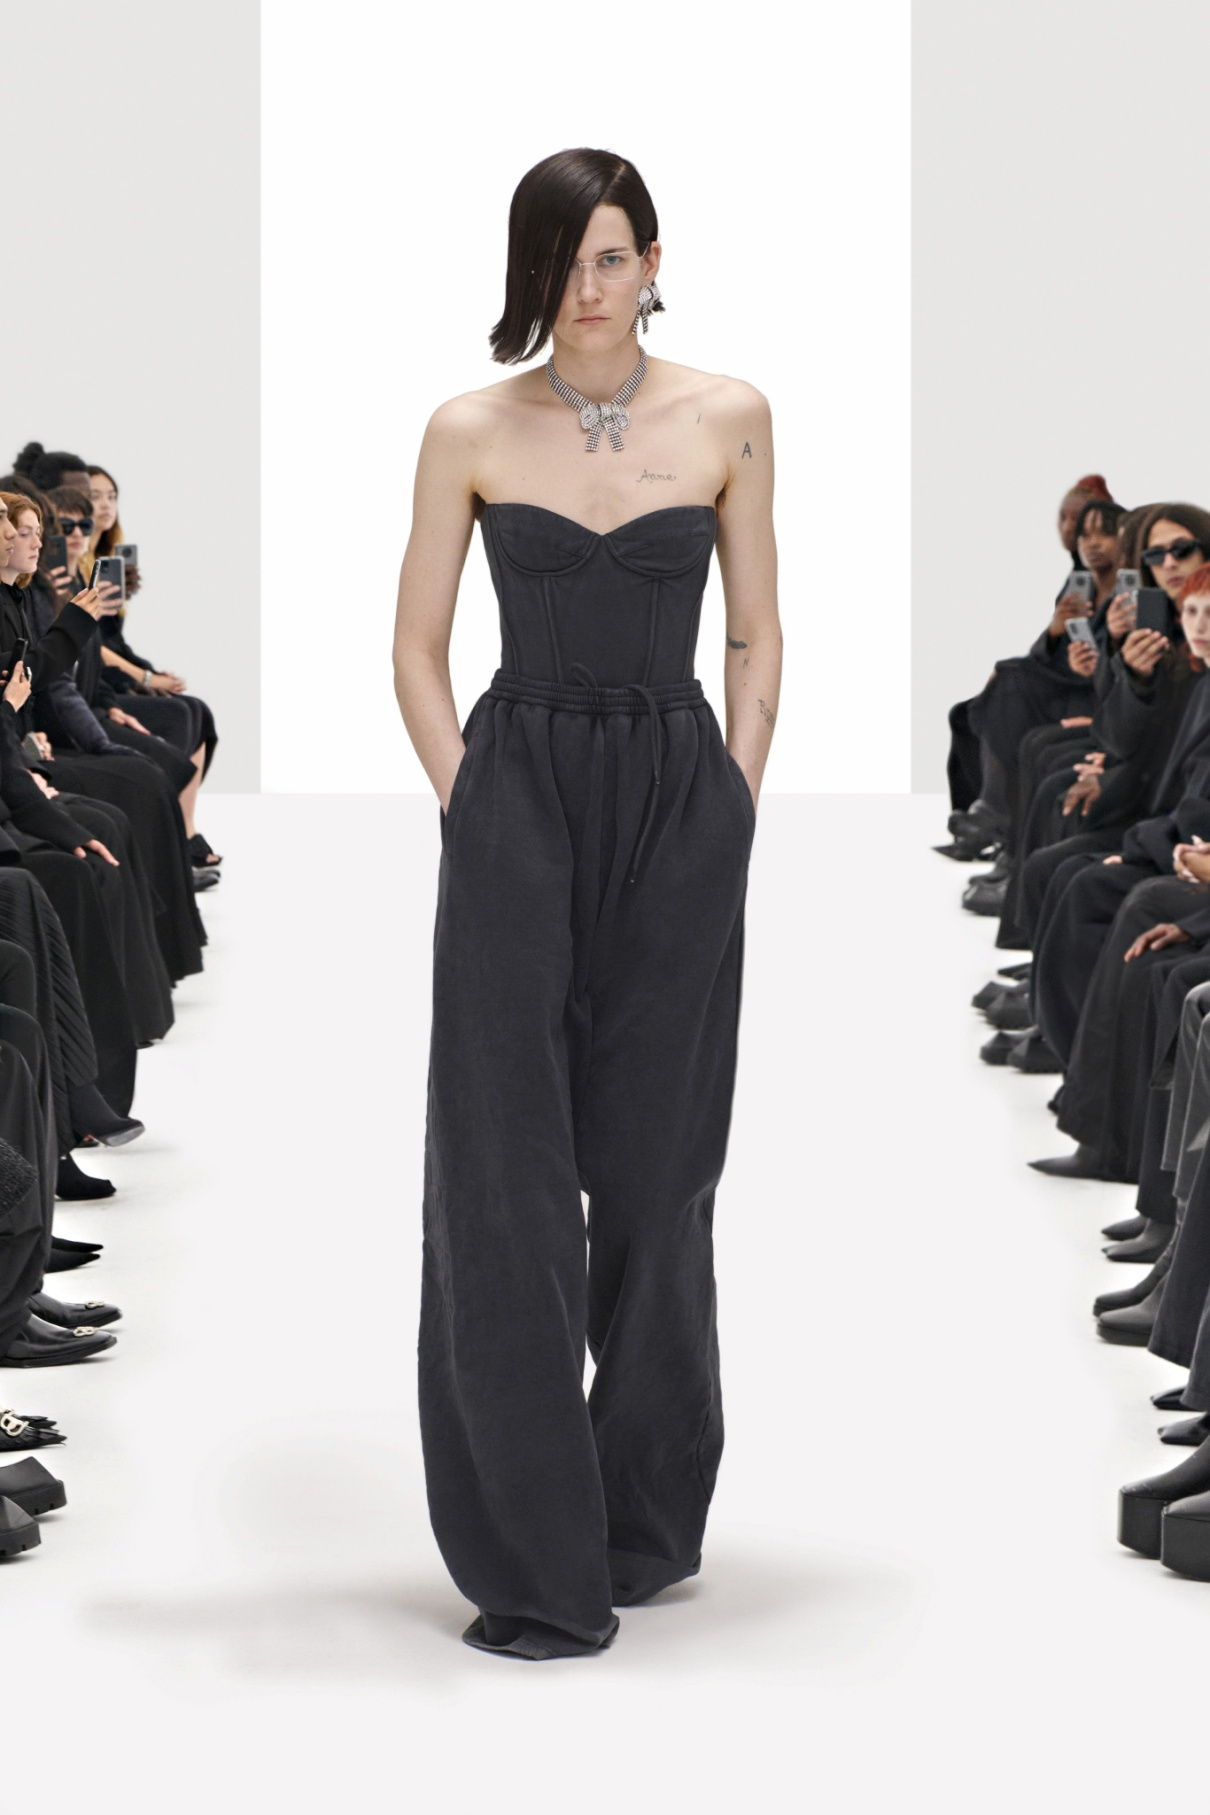 Balenciaga Spring 2022 RTW blk jumpsuit.jpg